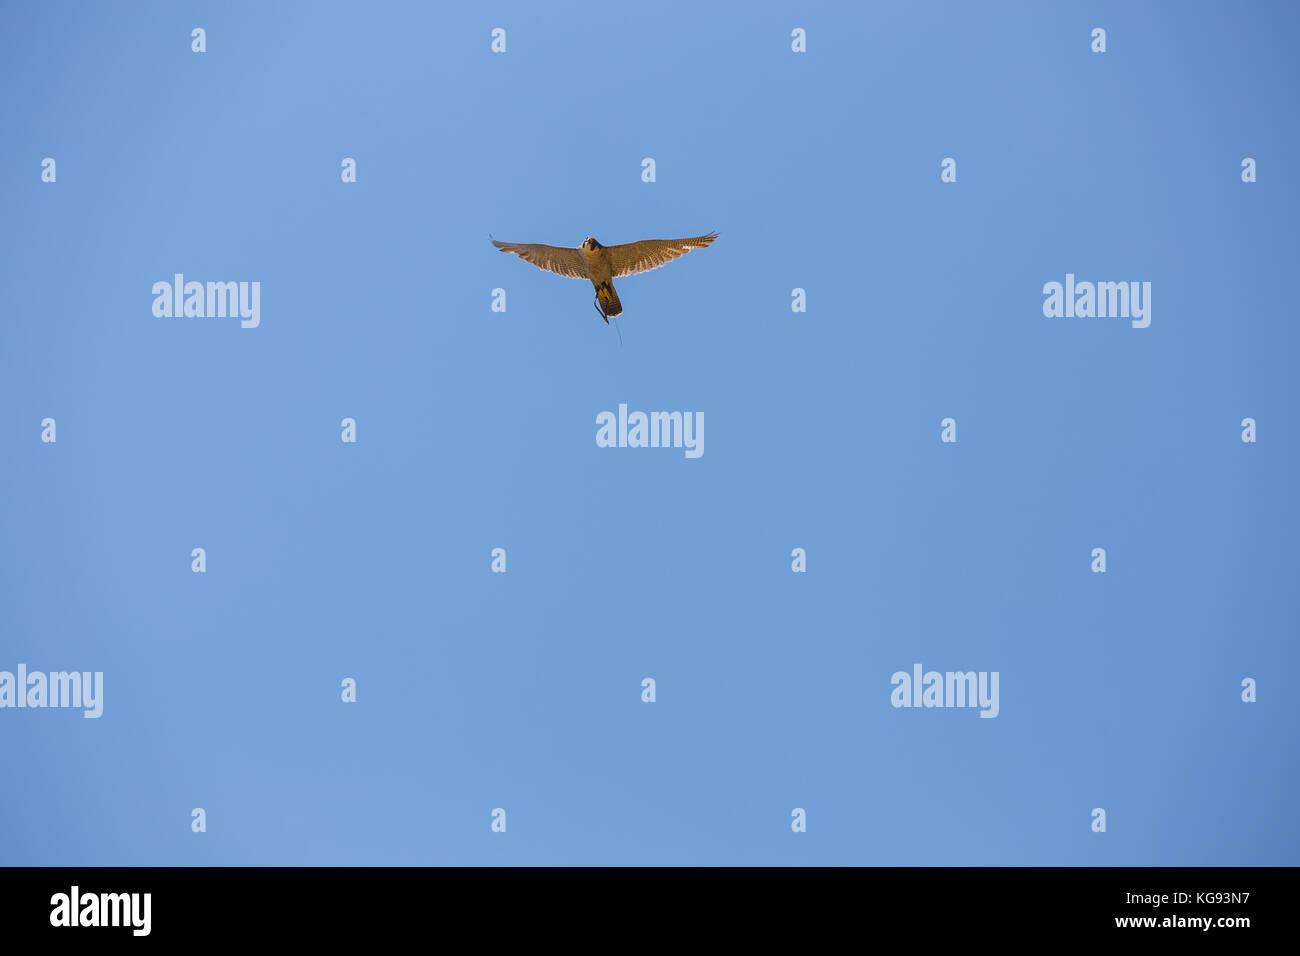 Hawk in flight,Peregrine falcon, Hawk peregrinus in the blue sky. - Stock Image